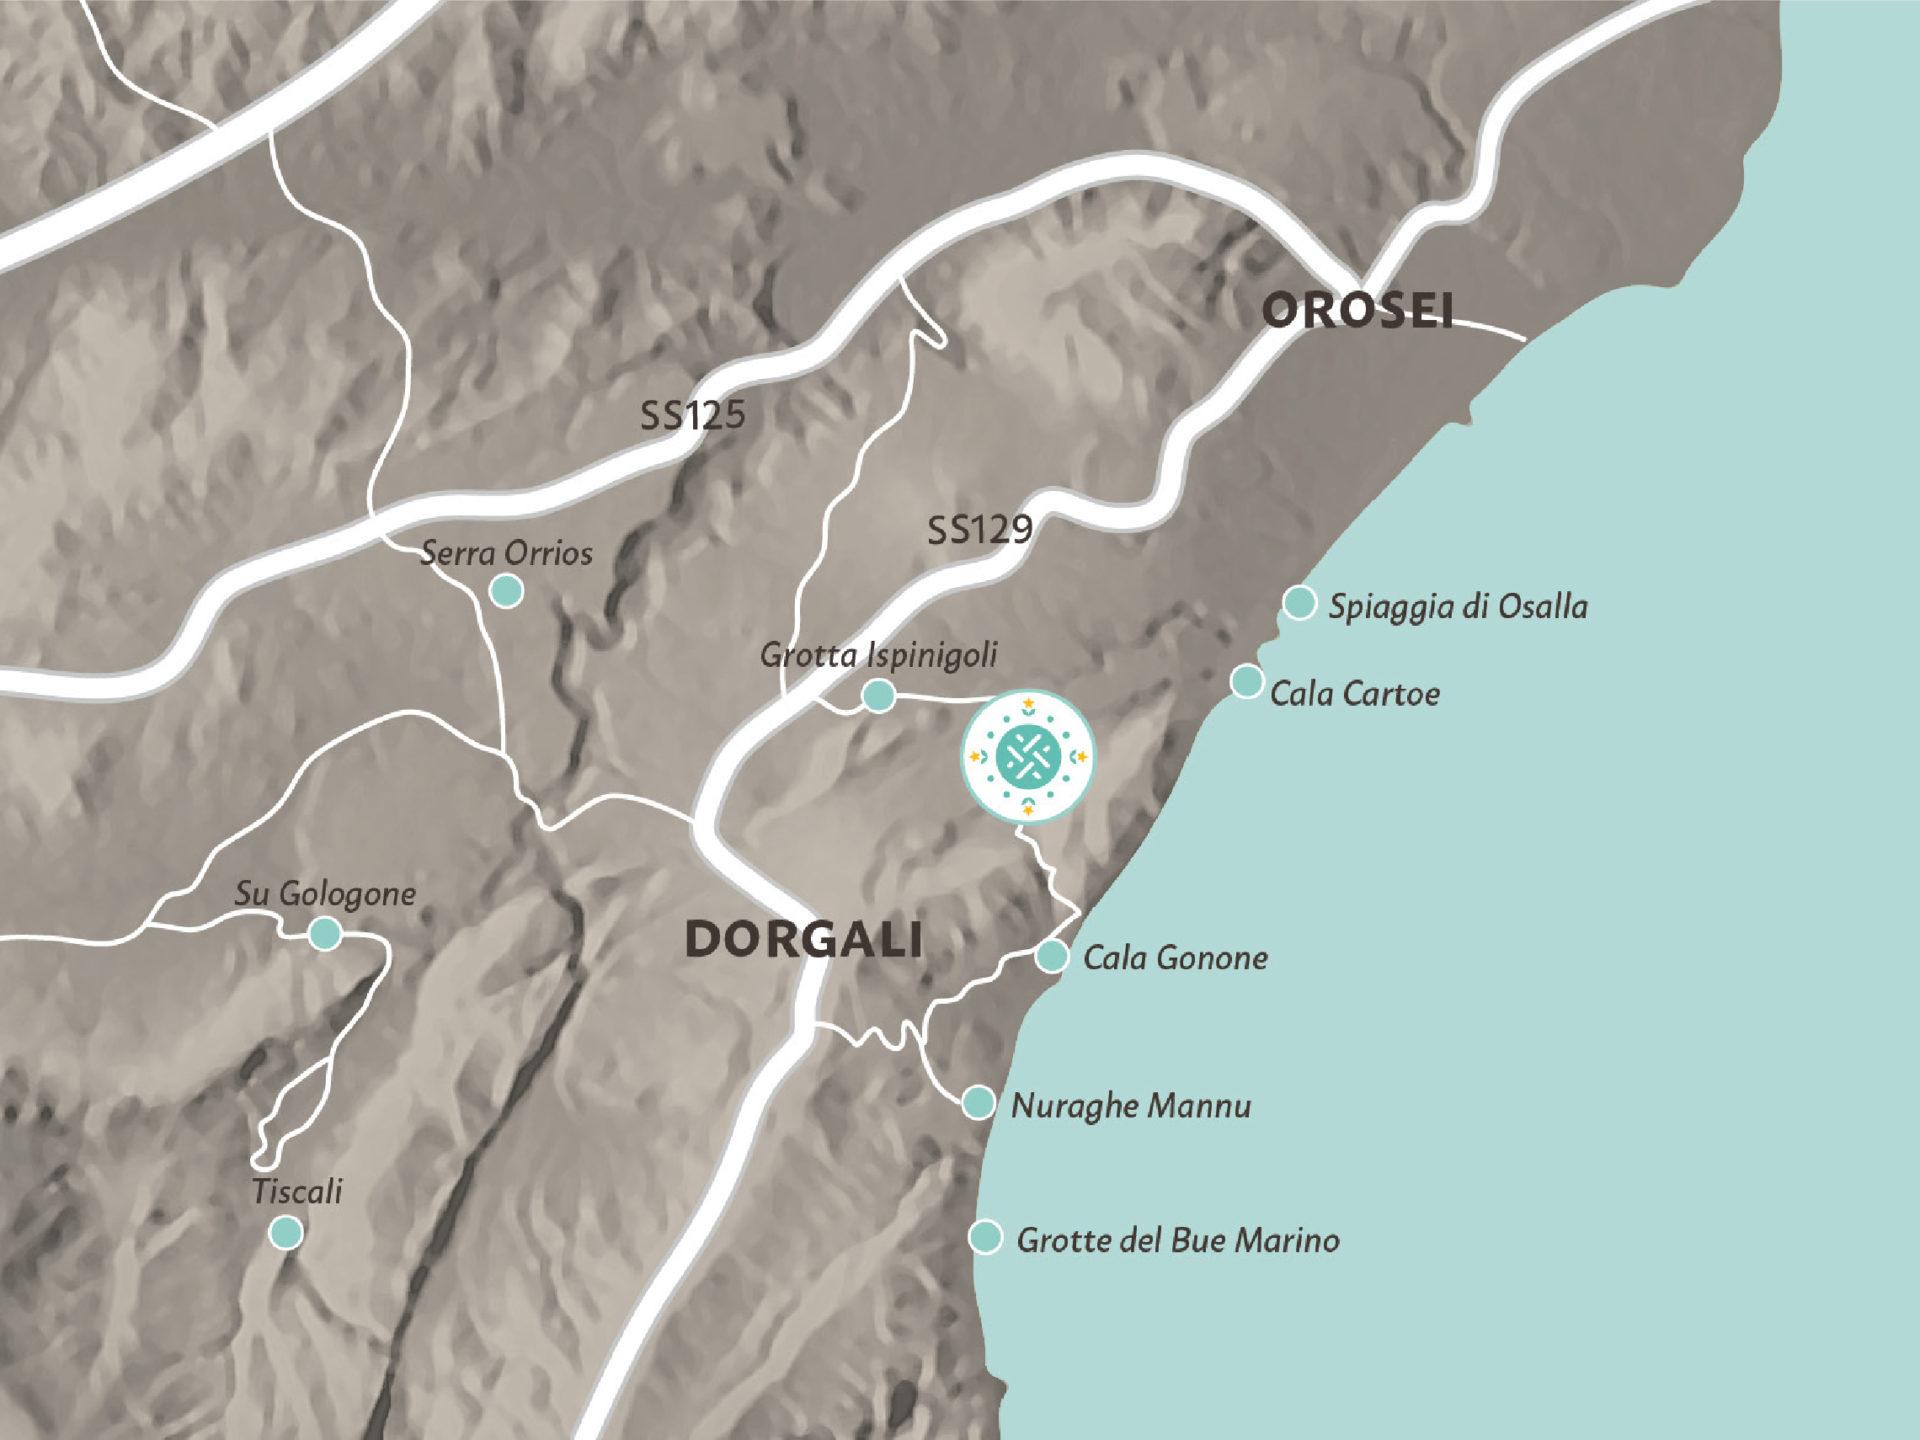 Cartina Michelin Roma.Dorgali Sardinia Map